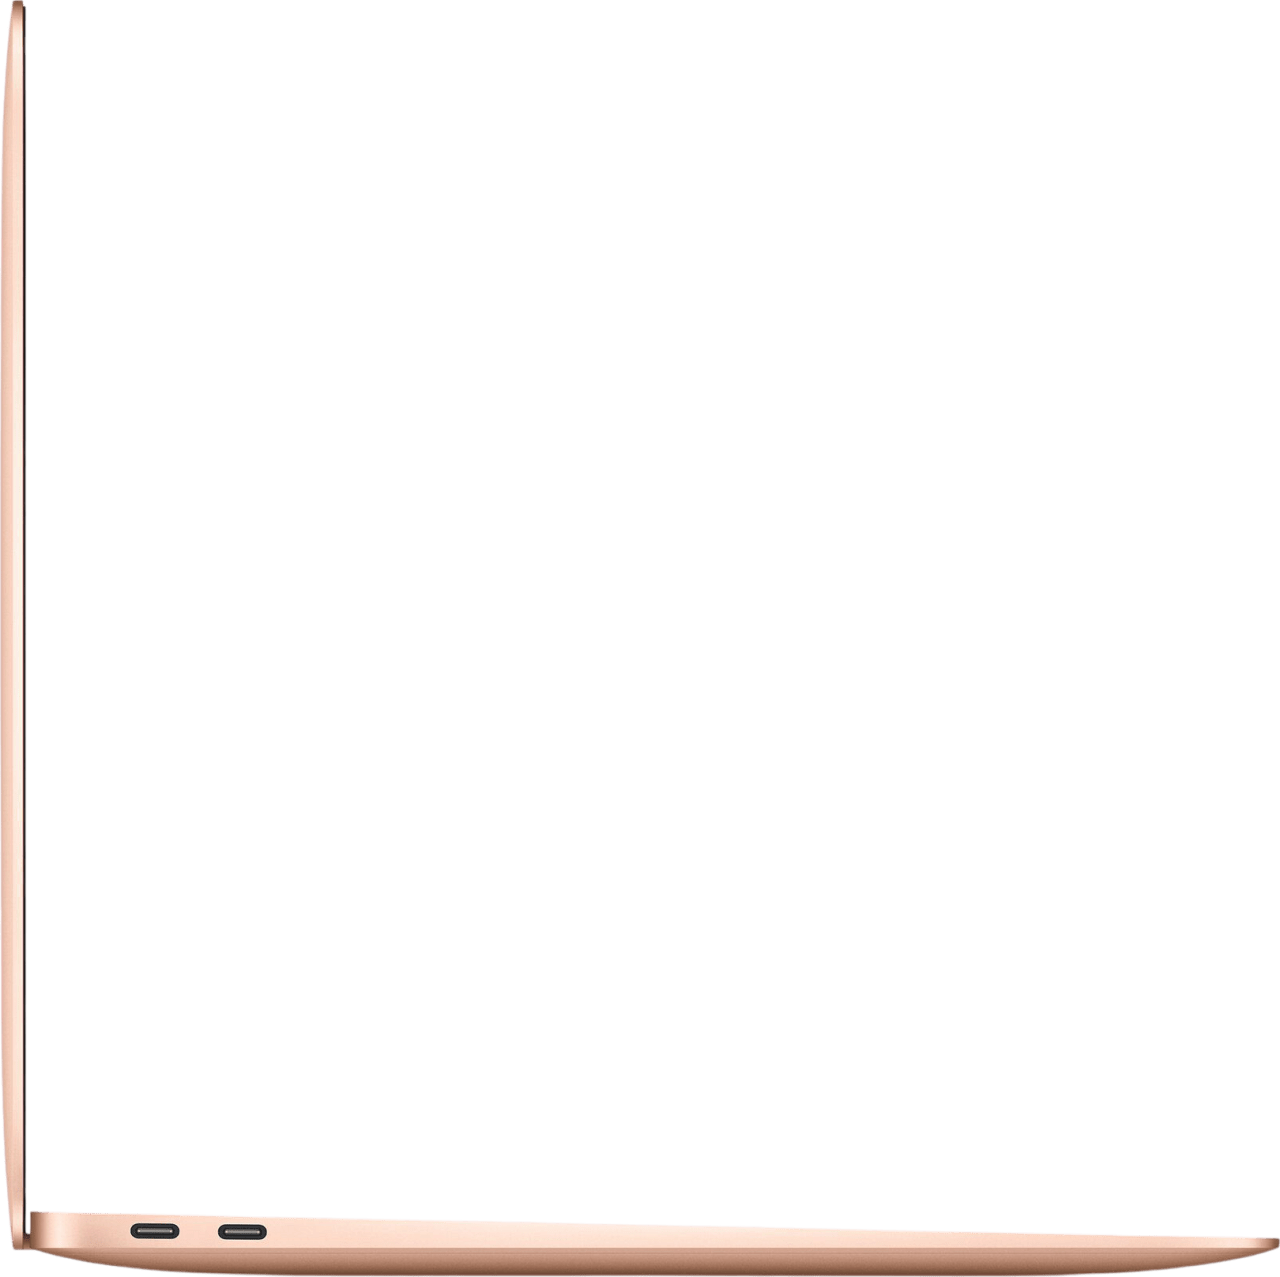 Gold Apple MacBook Air (Late 2020) Laptop - Apple M1 - 16GB - 512GB SSD - Apple Integrated 8-core GPU.3